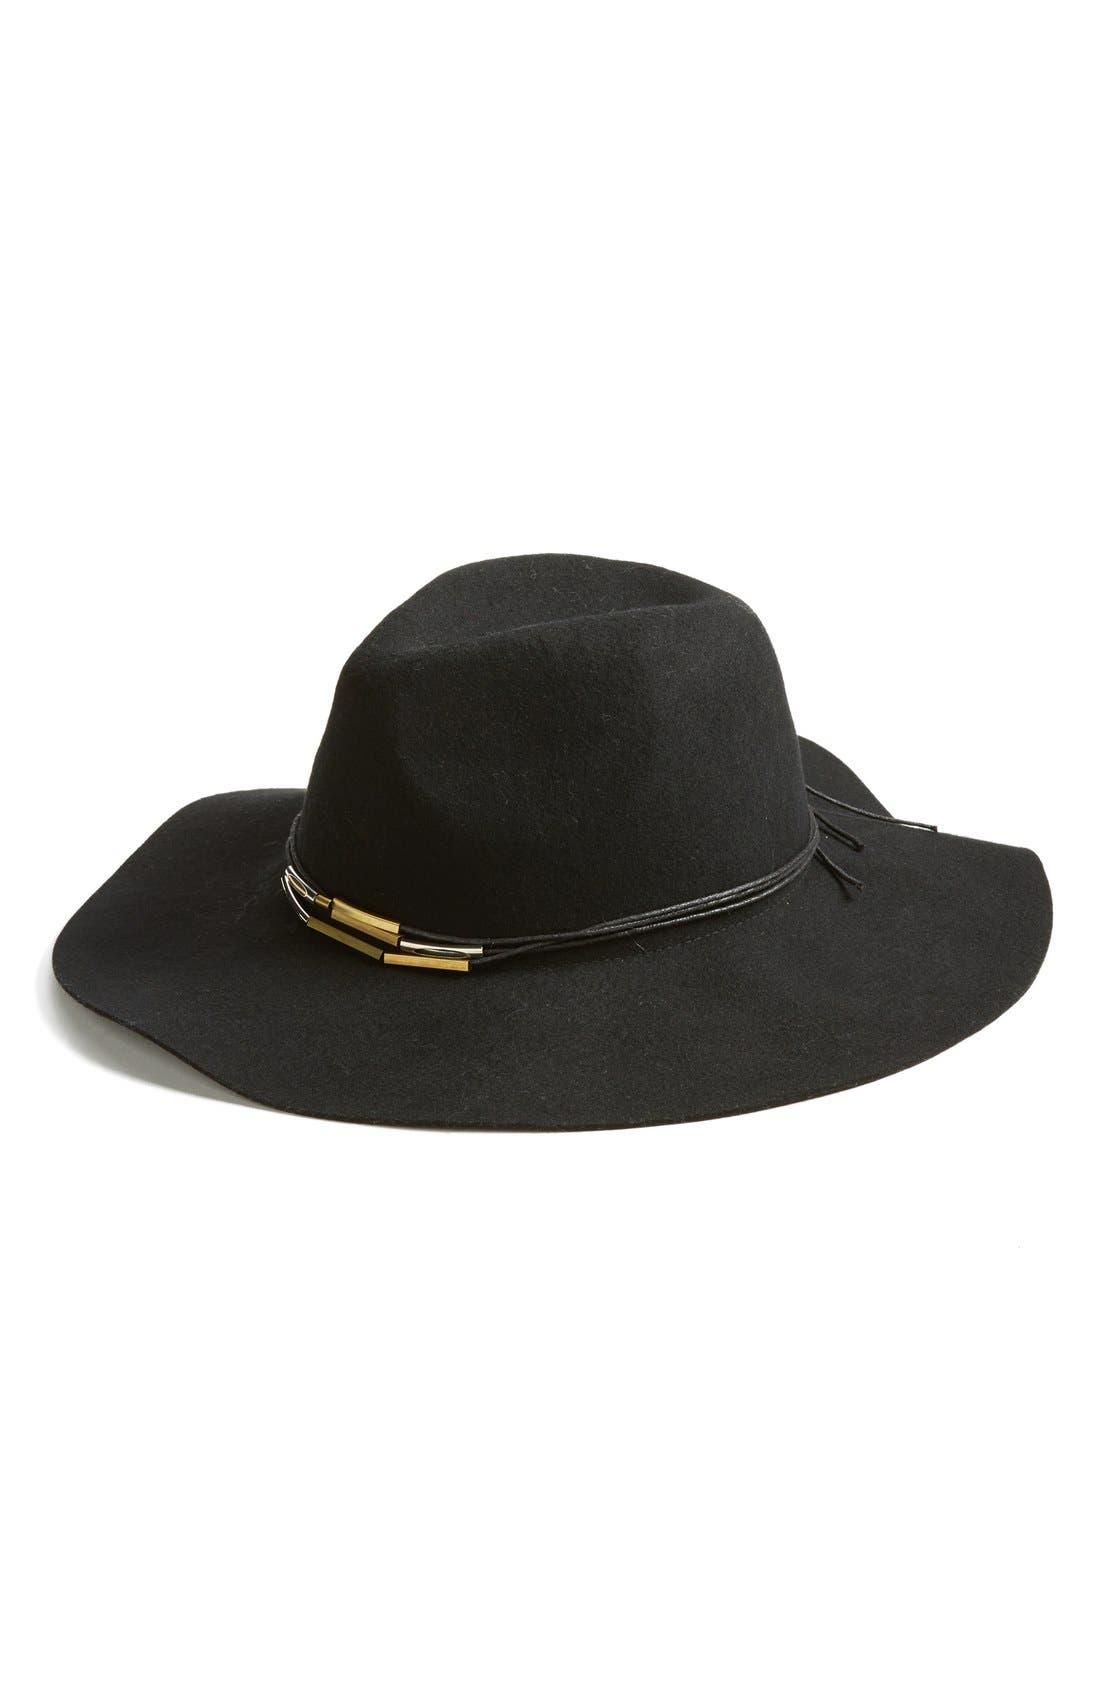 Alternate Image 1 Selected - BP. Metal Bead Wool Felt Panama Hat